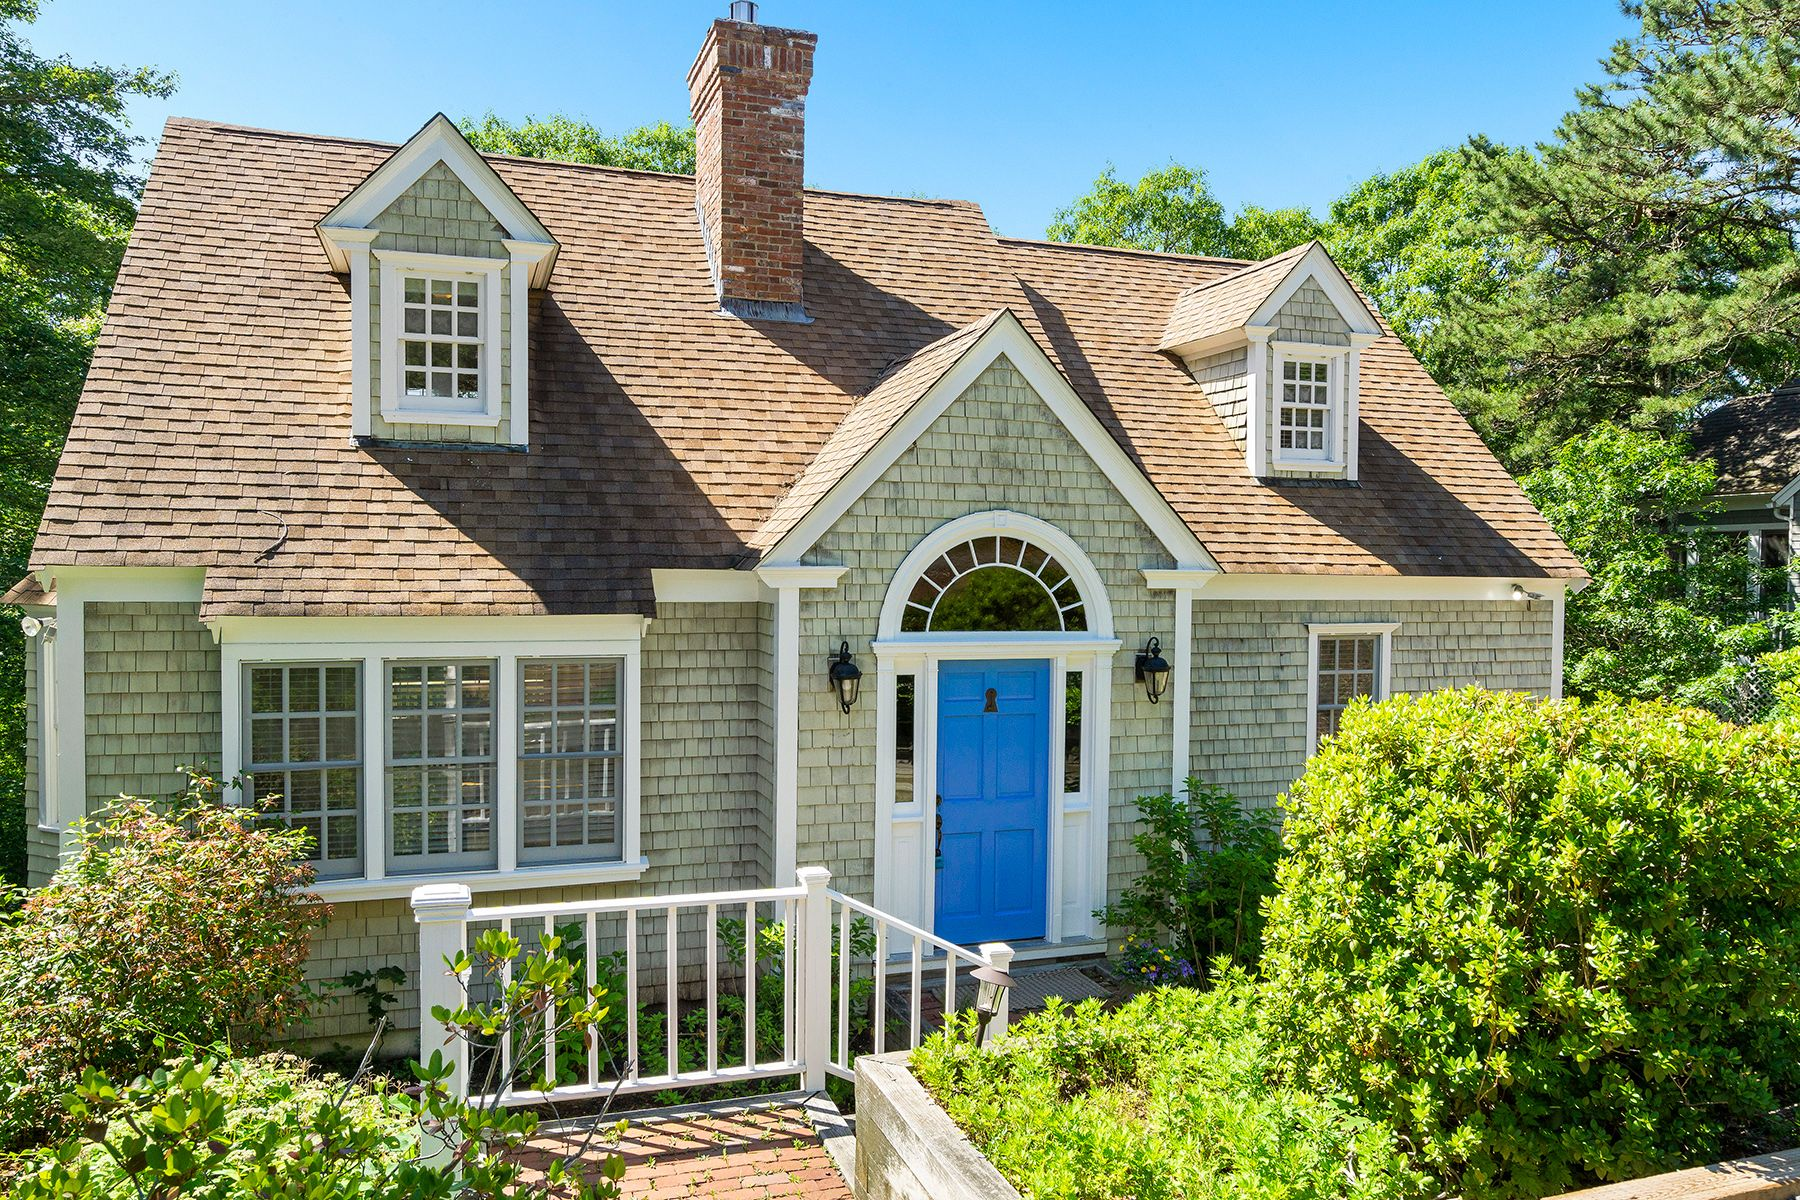 Single Family Homes for Active at 48 Summersea Road, New Seabury 48 Summersea Road Mashpee, Massachusetts 02649 United States